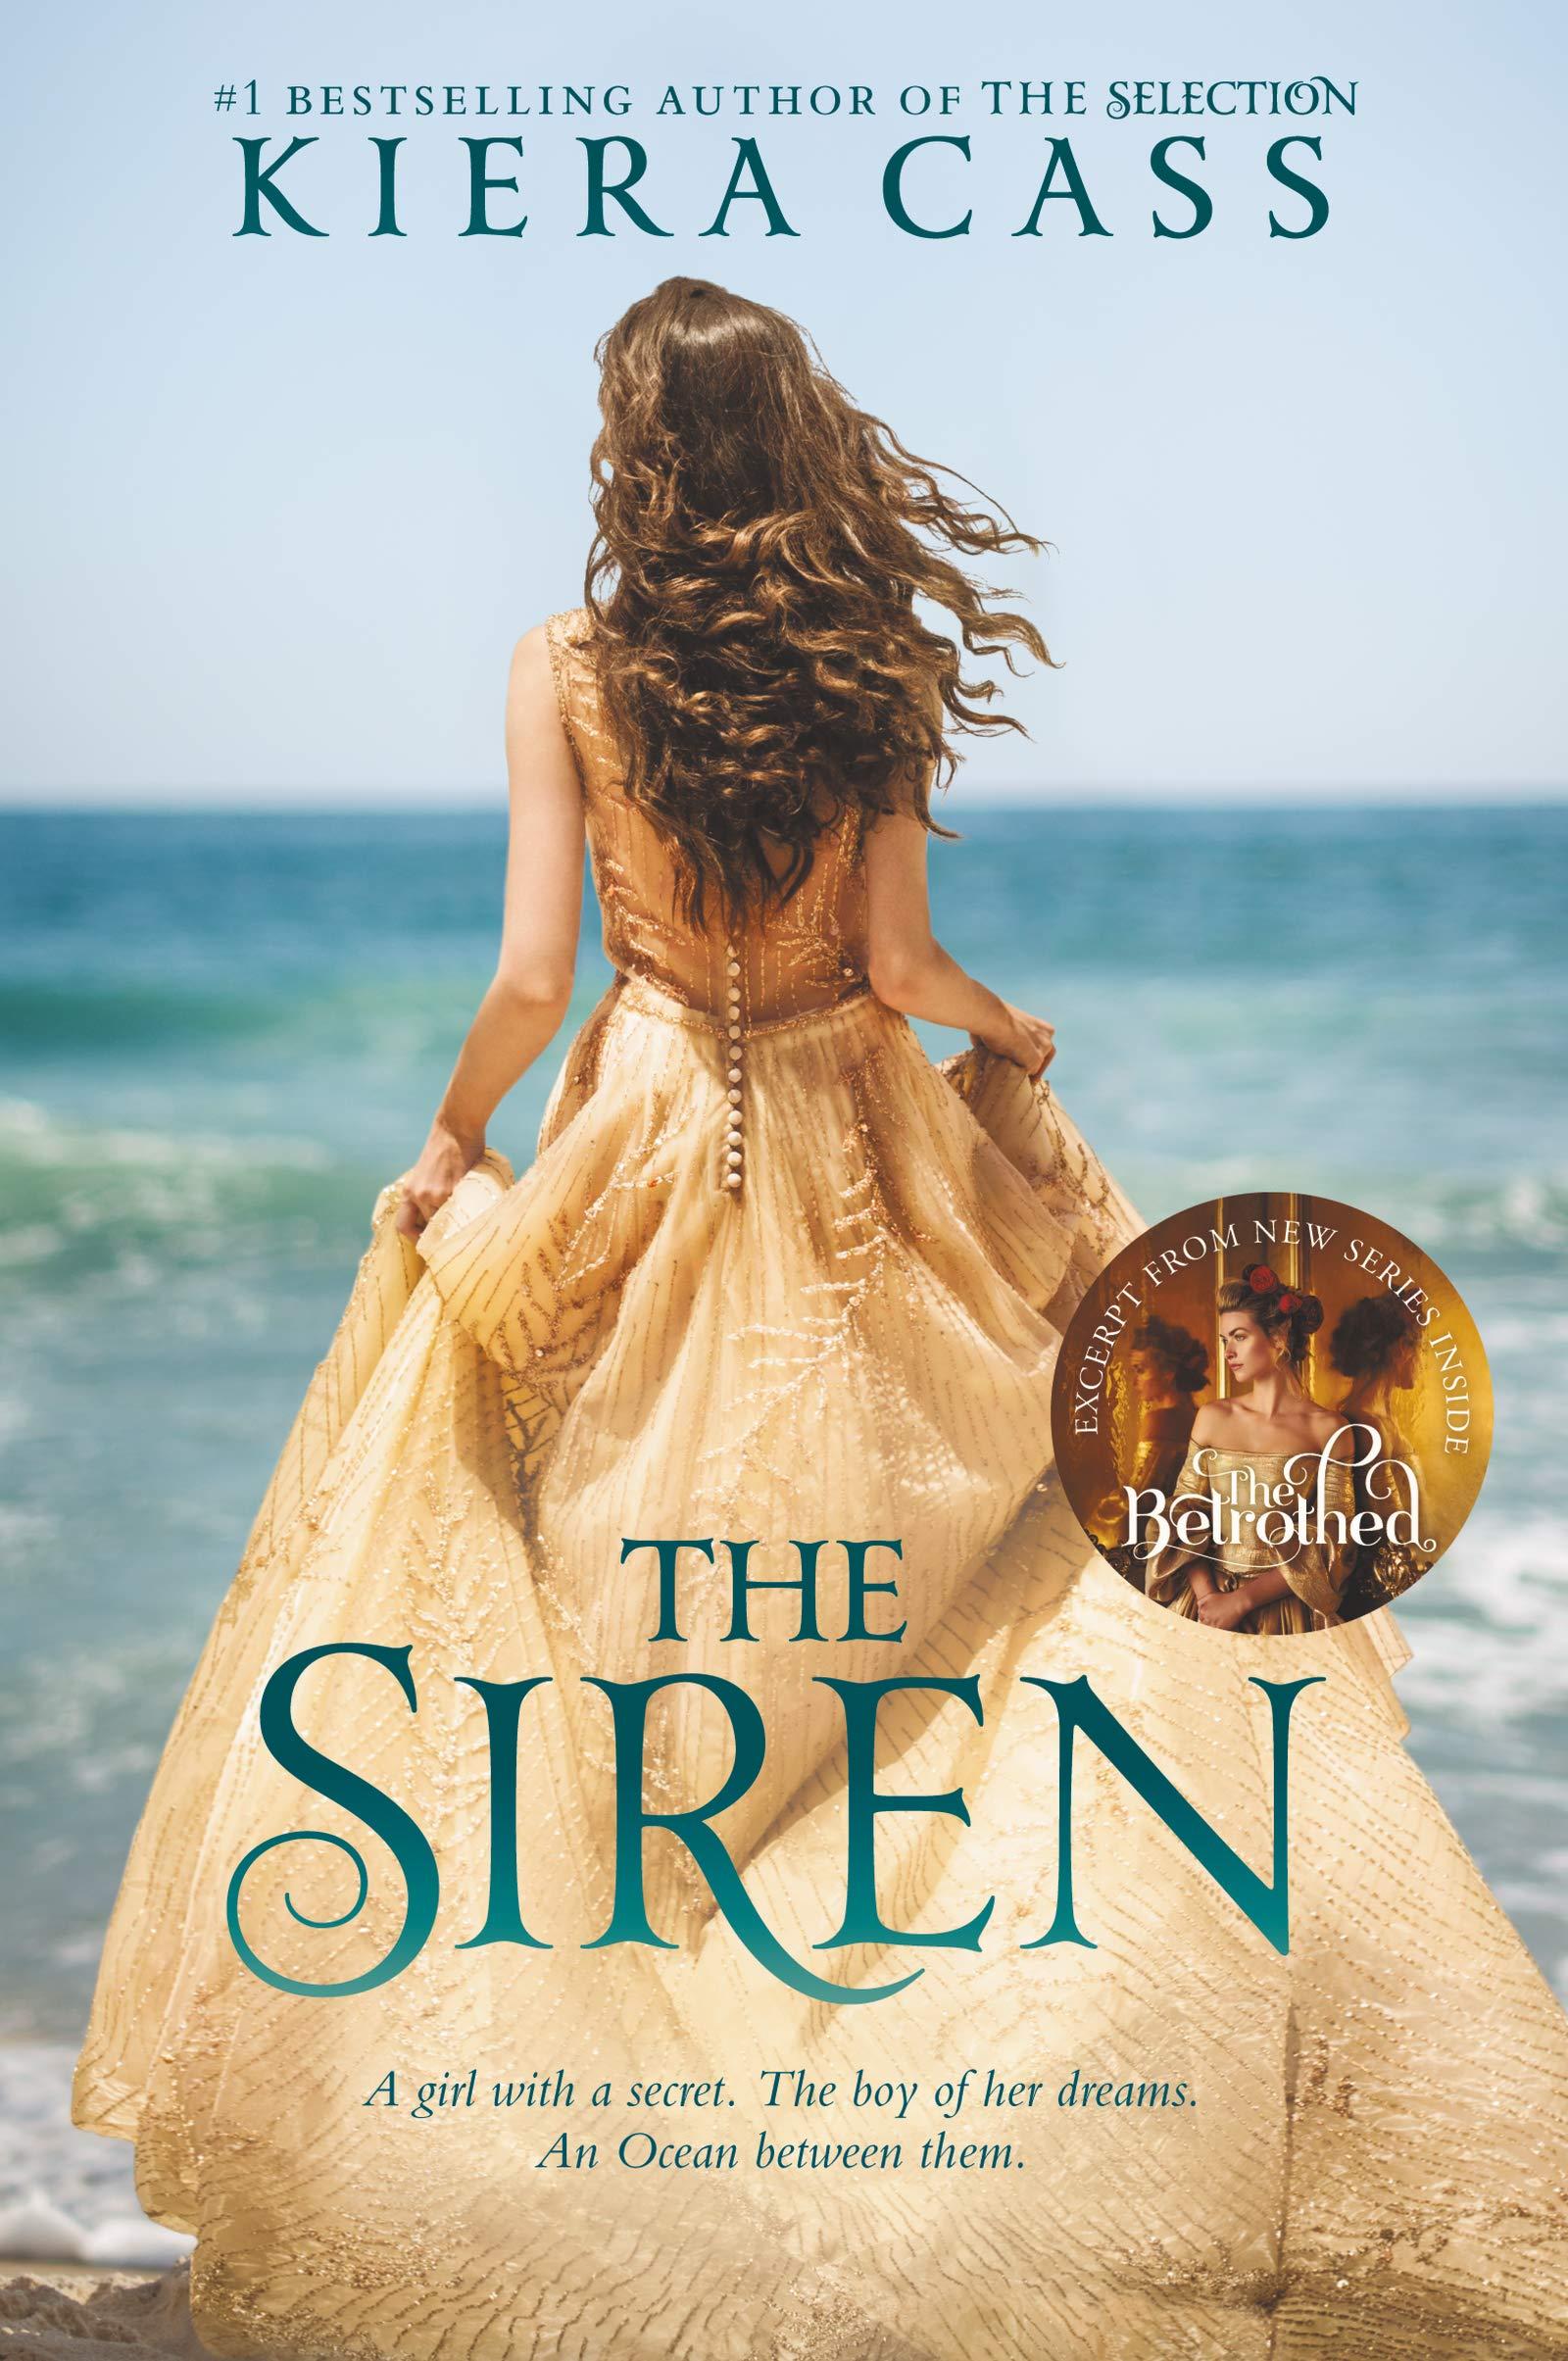 Amazon.com: The Siren: 9780062392008: Cass, Kiera: Books